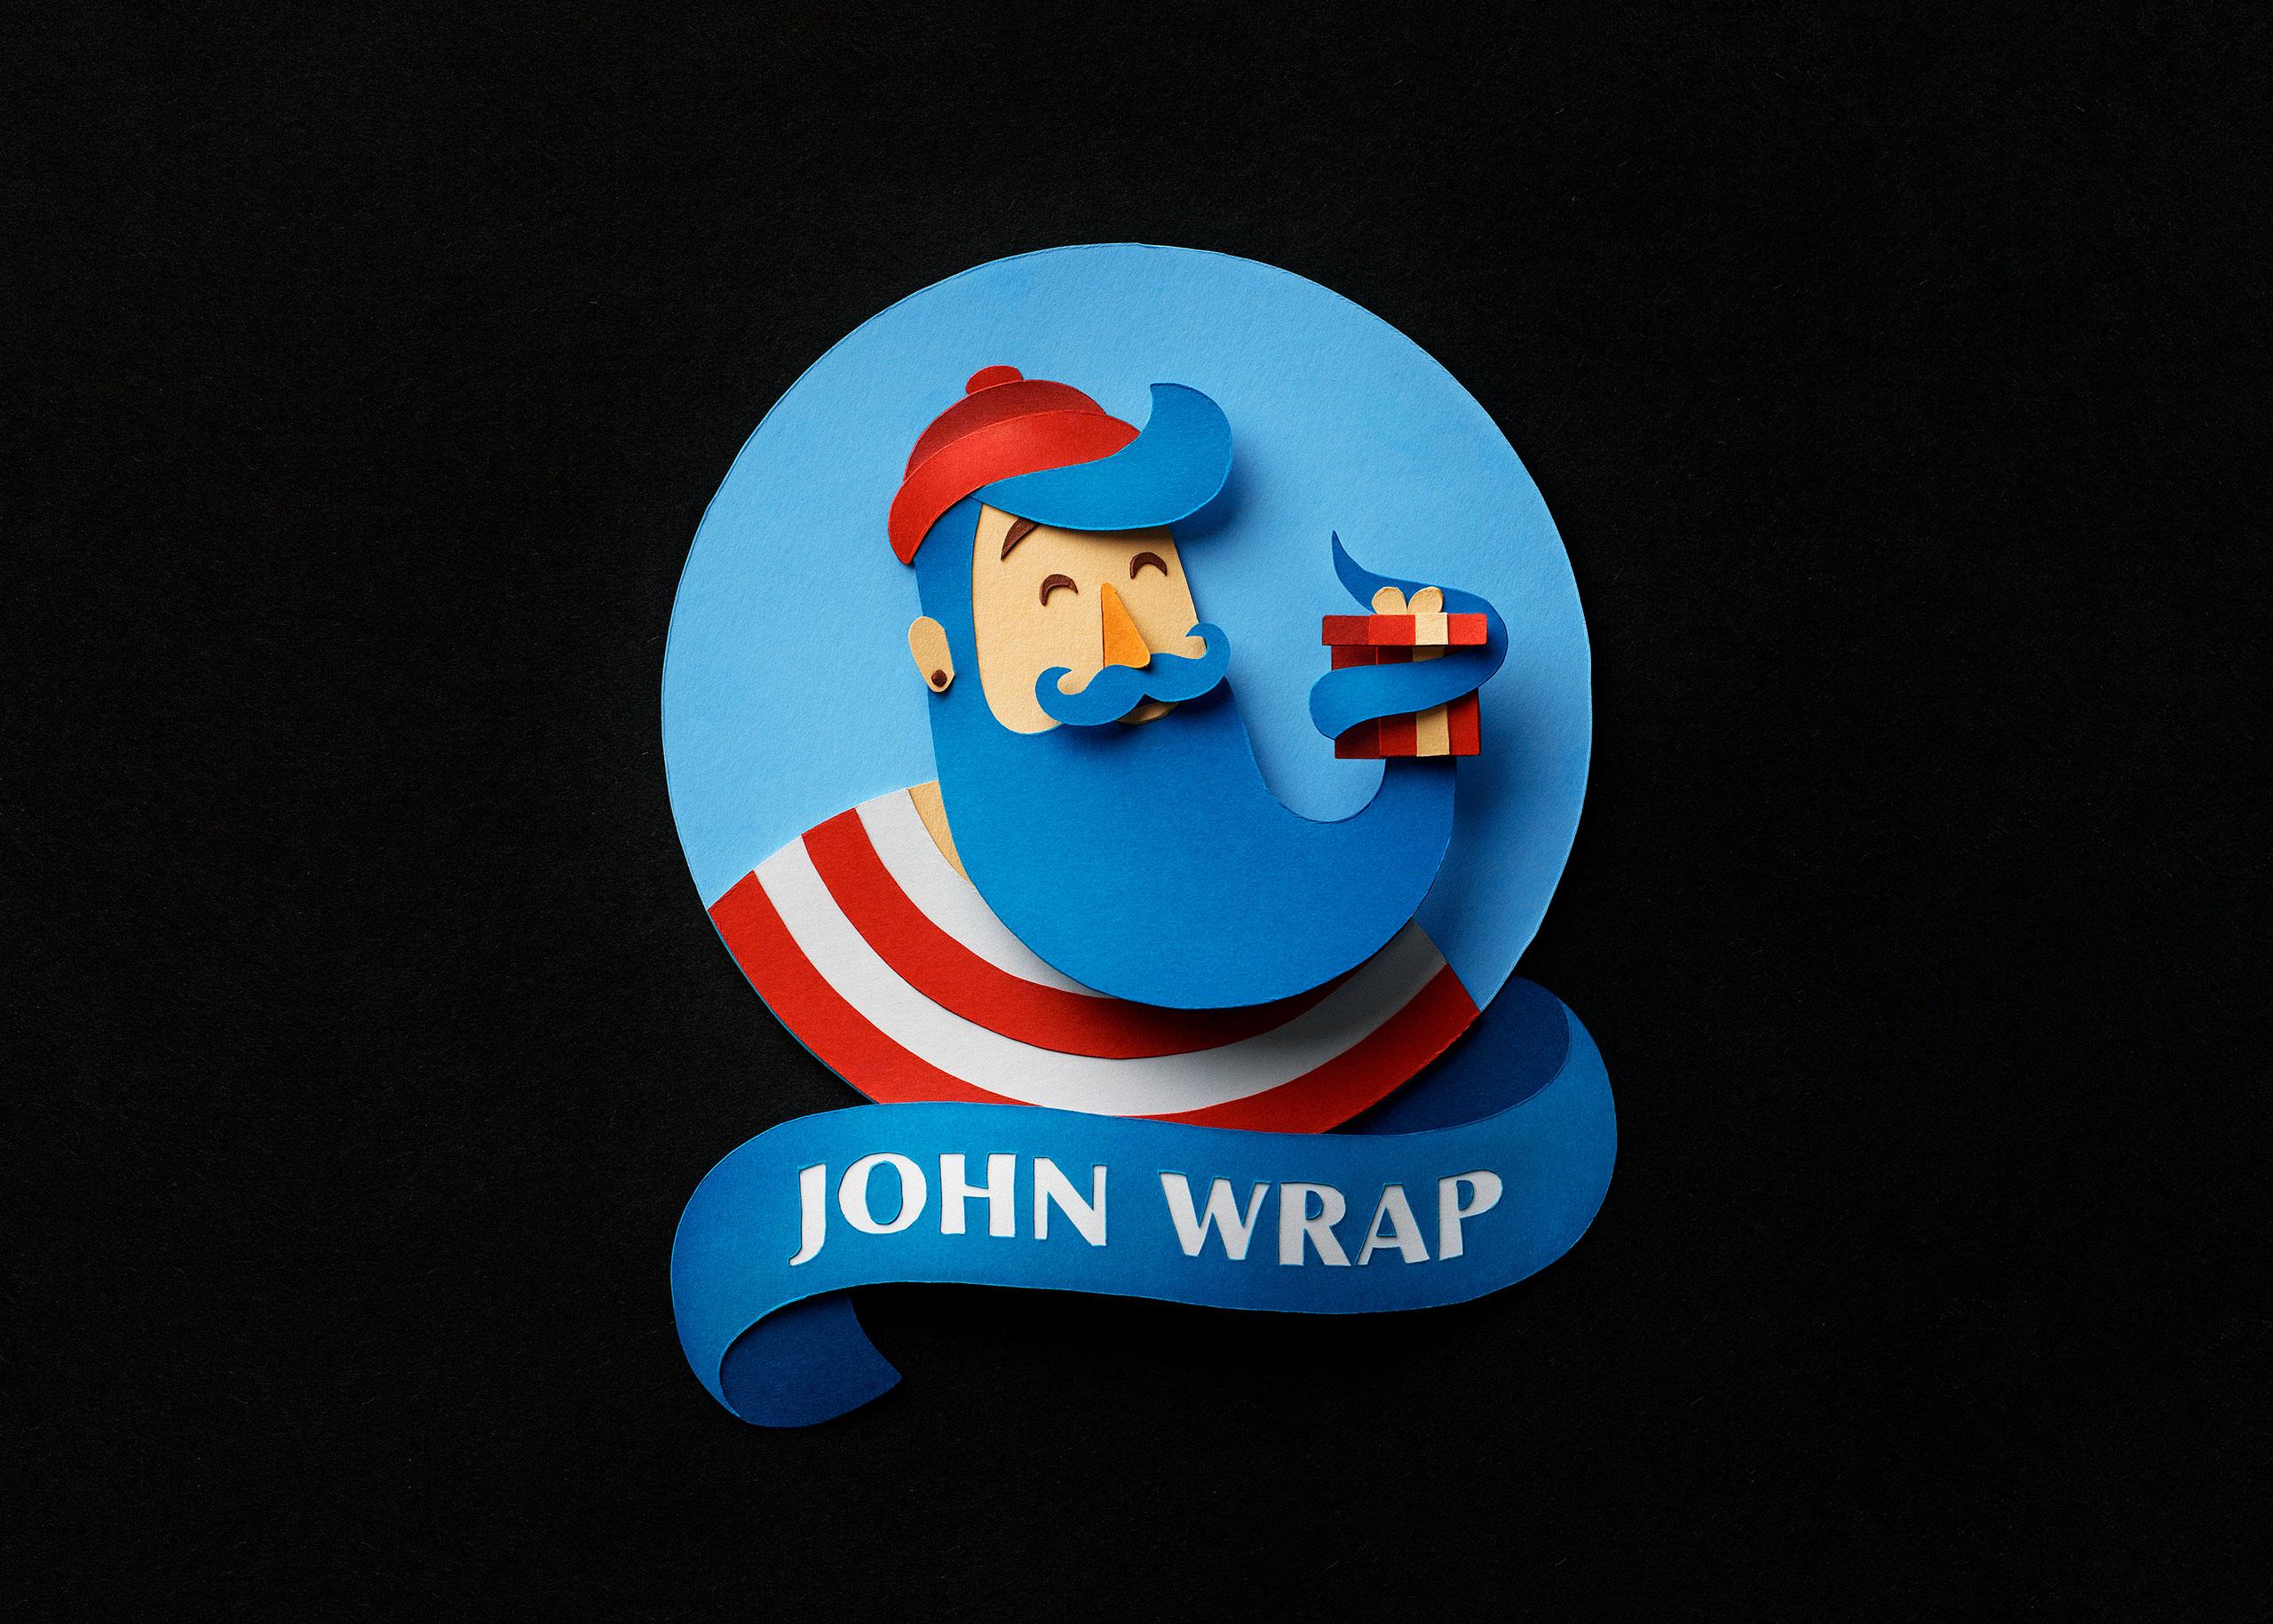 JW_Logo_Paper_Black_BG_w2560_quality60